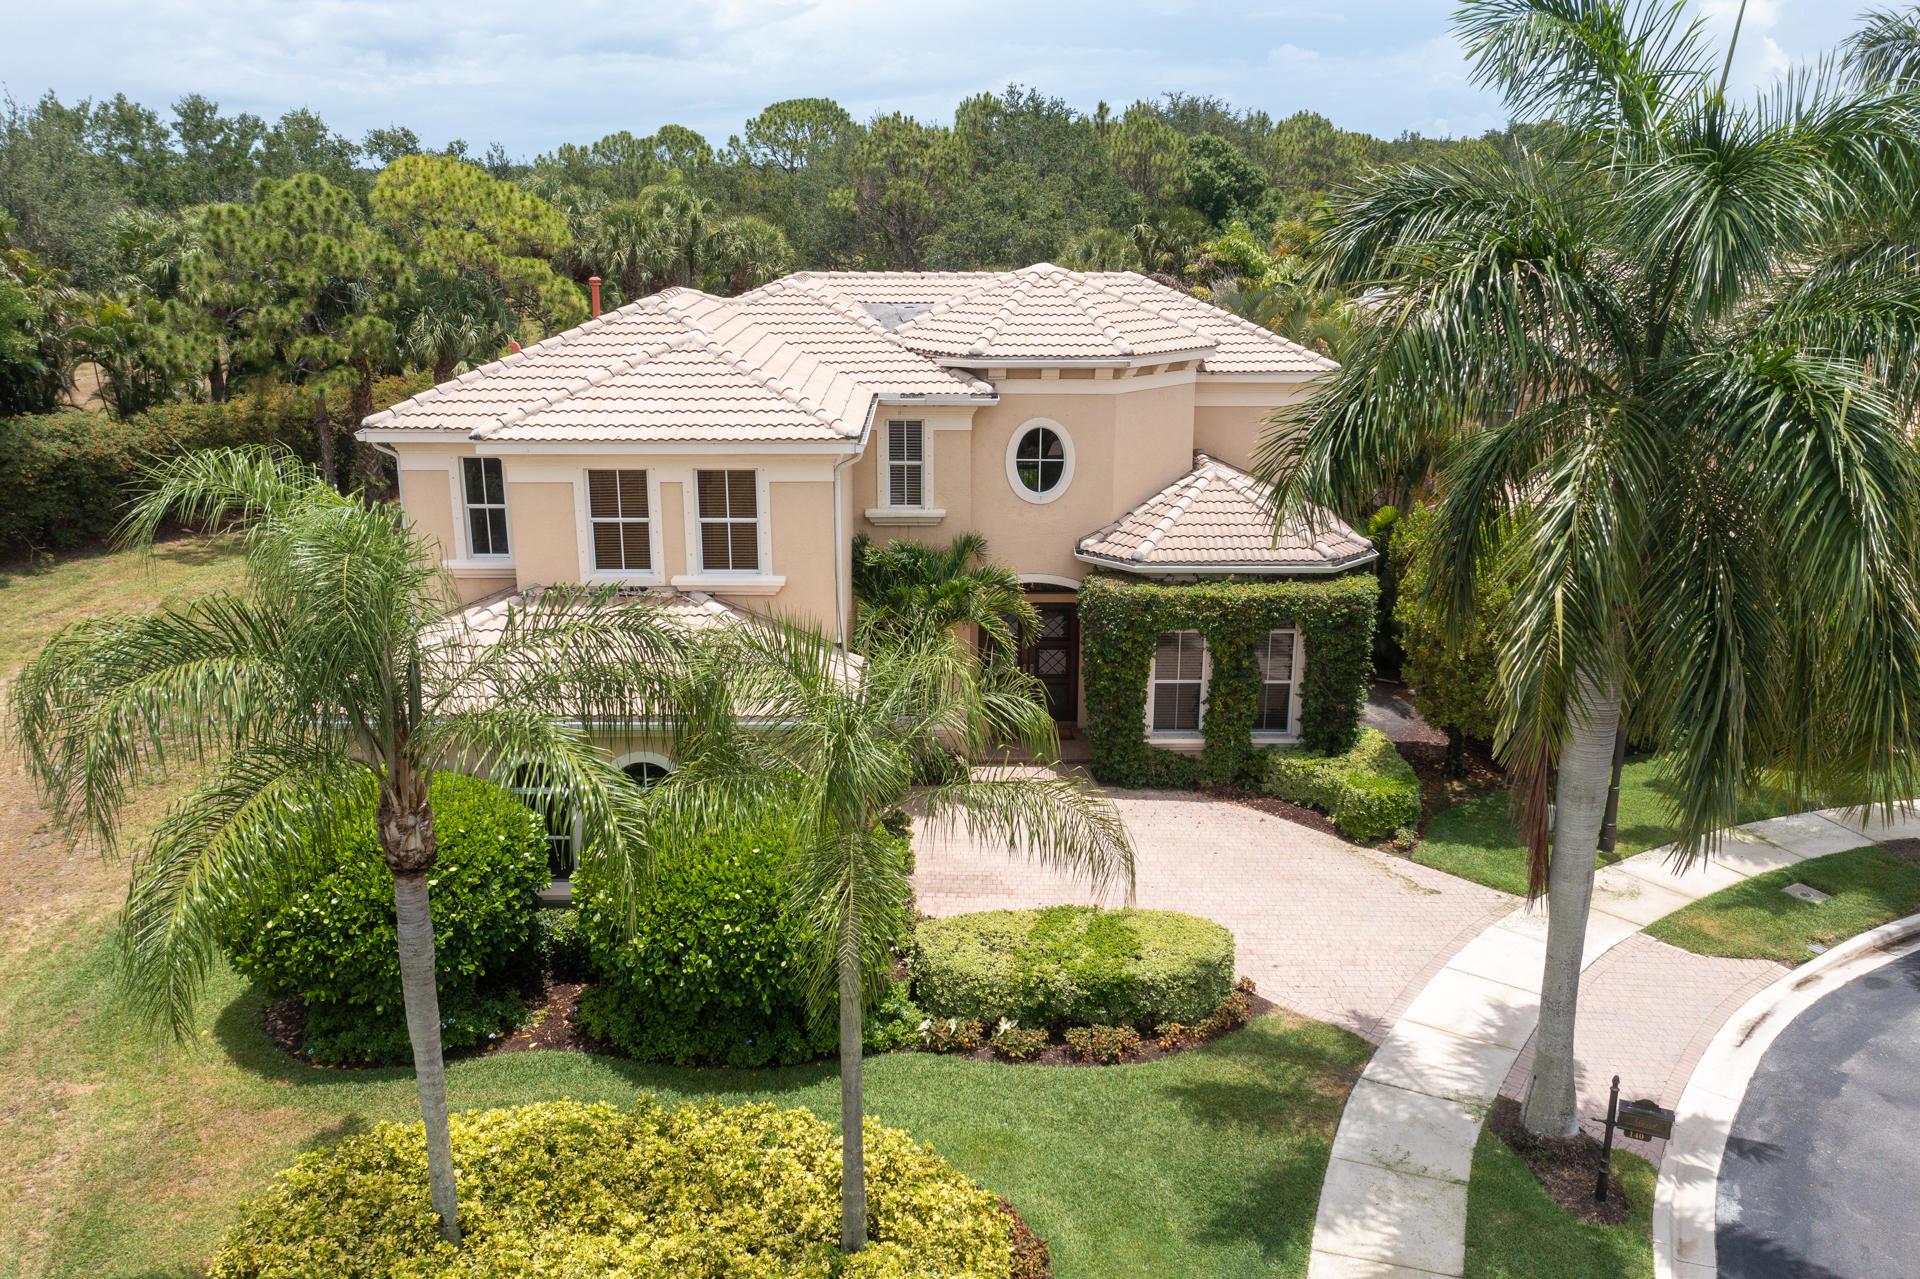 140 Tranquilla Drive, Palm Beach Gardens, Florida 33418, 5 Bedrooms Bedrooms, ,5.1 BathroomsBathrooms,A,Single family,Tranquilla,RX-10701318